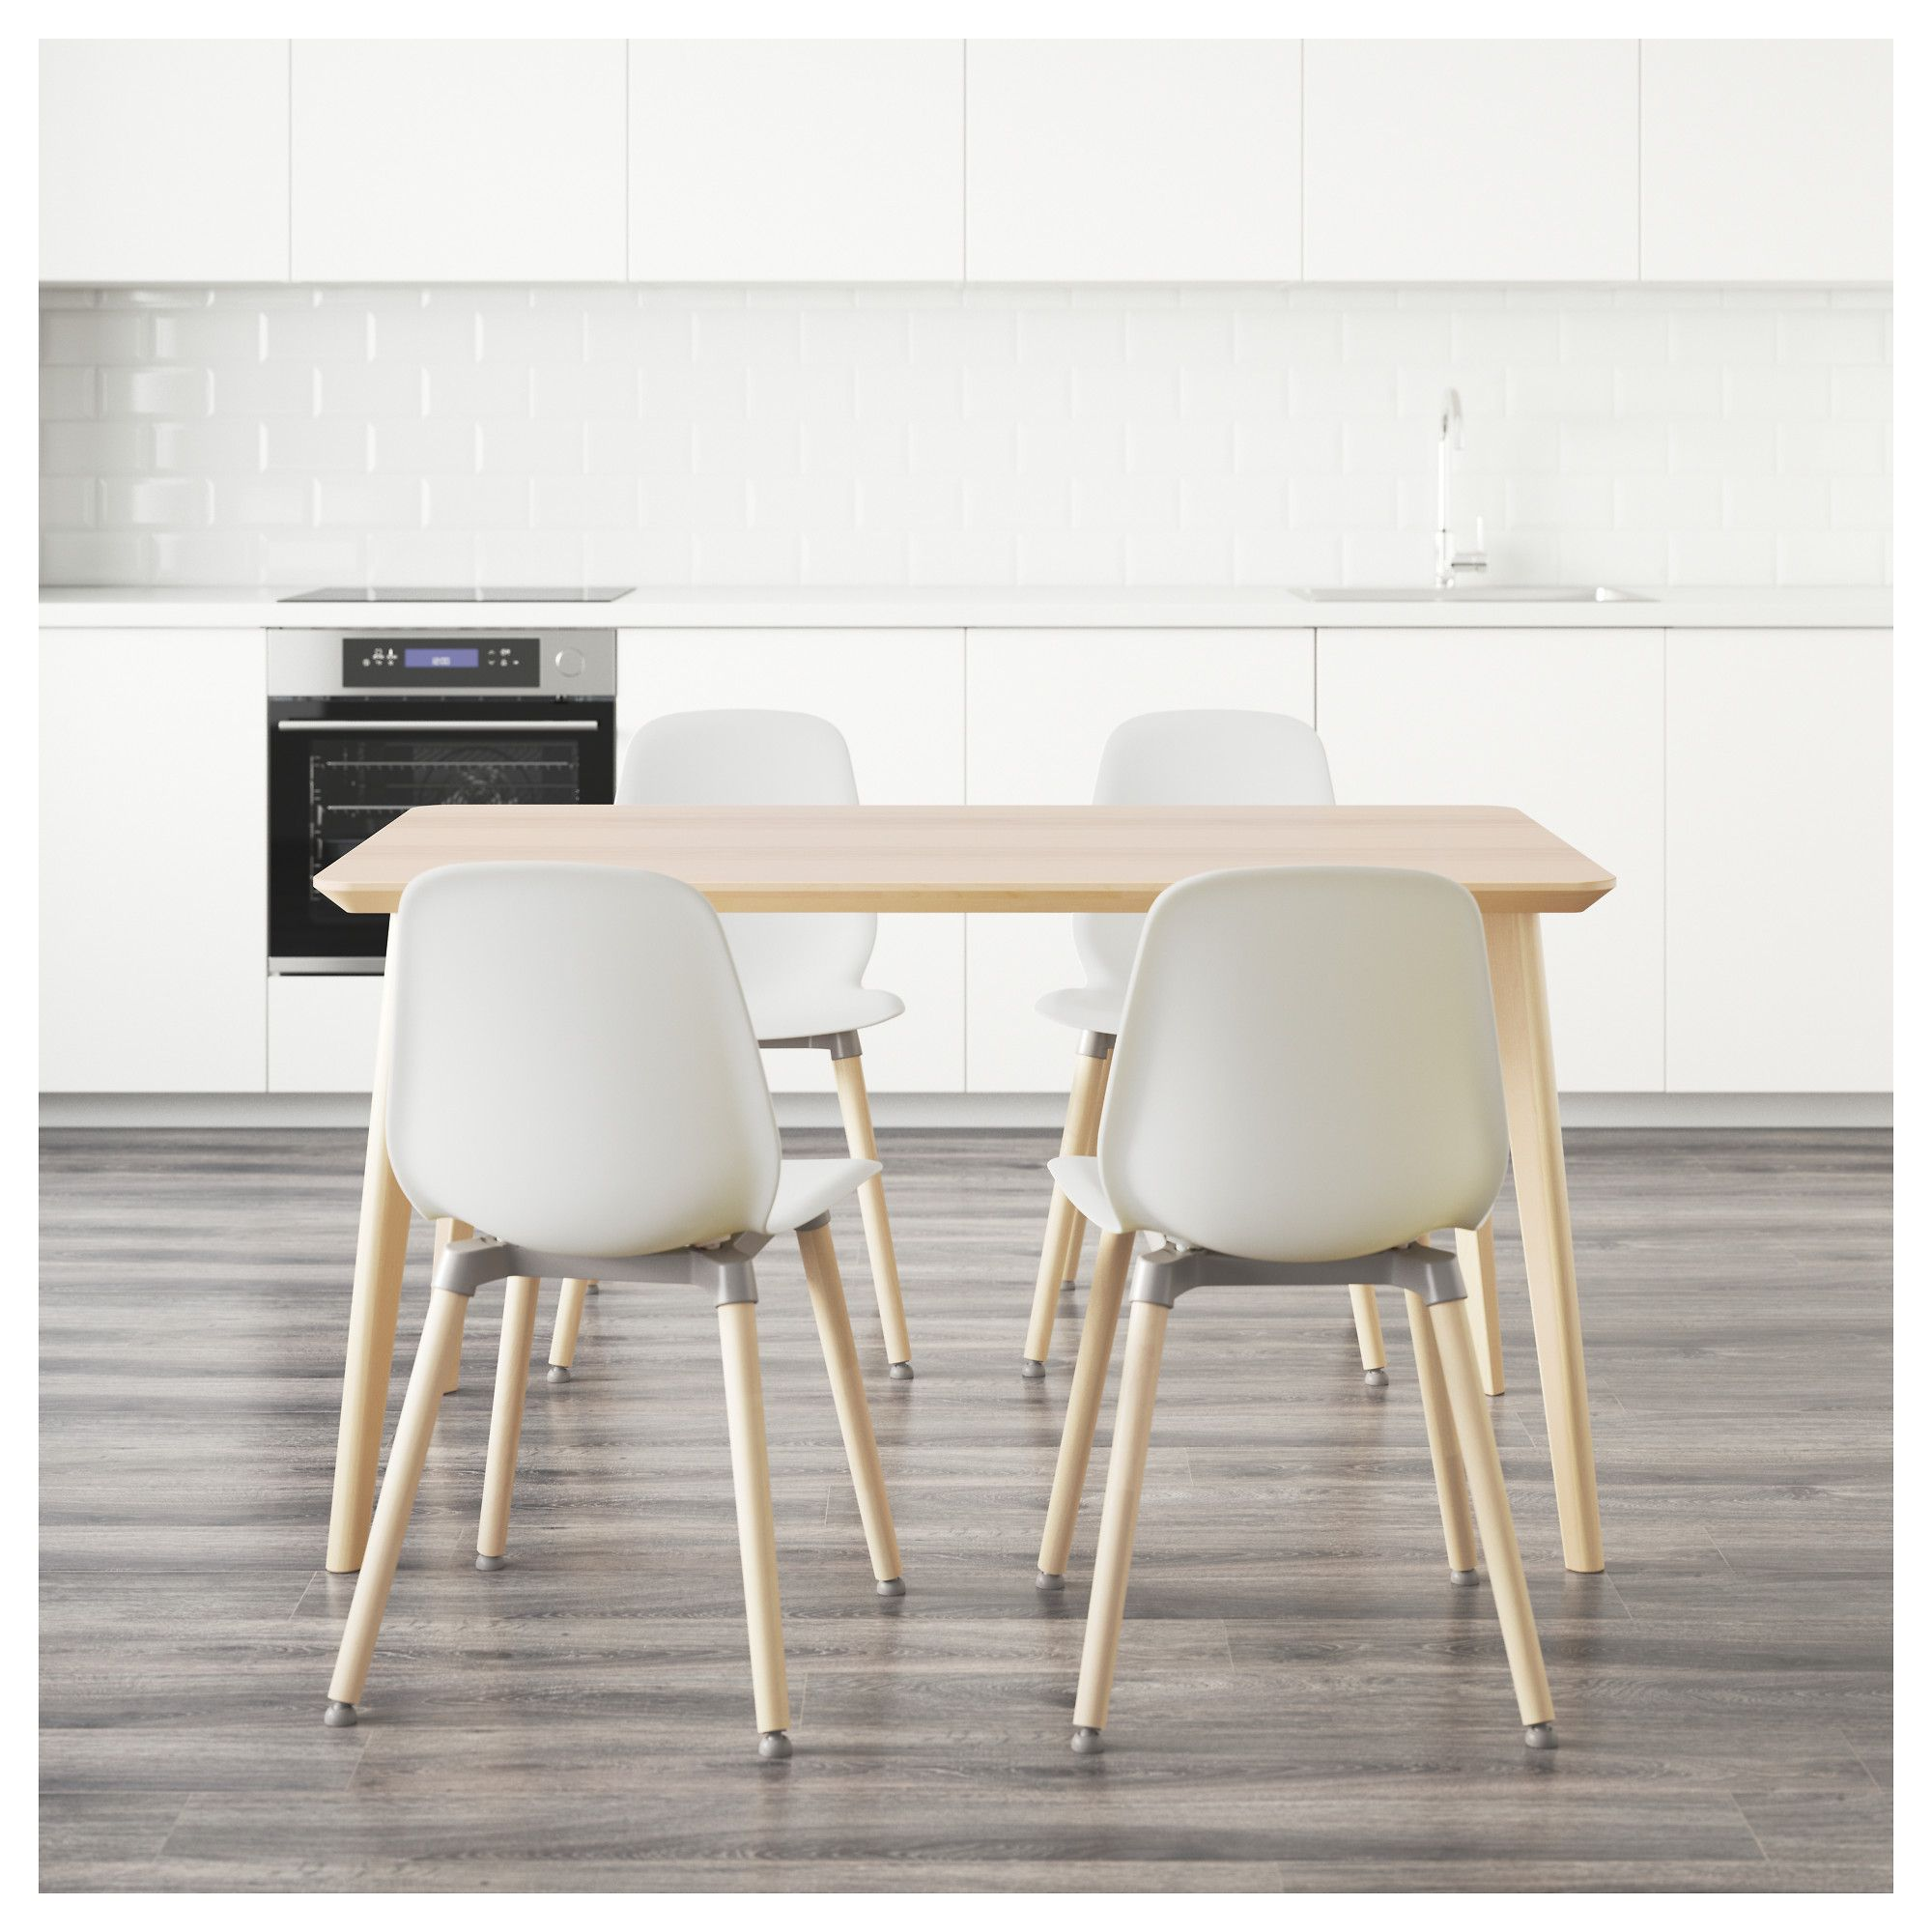 LISABO / LEIFARNE Table and 4 chairs ash veneer, white